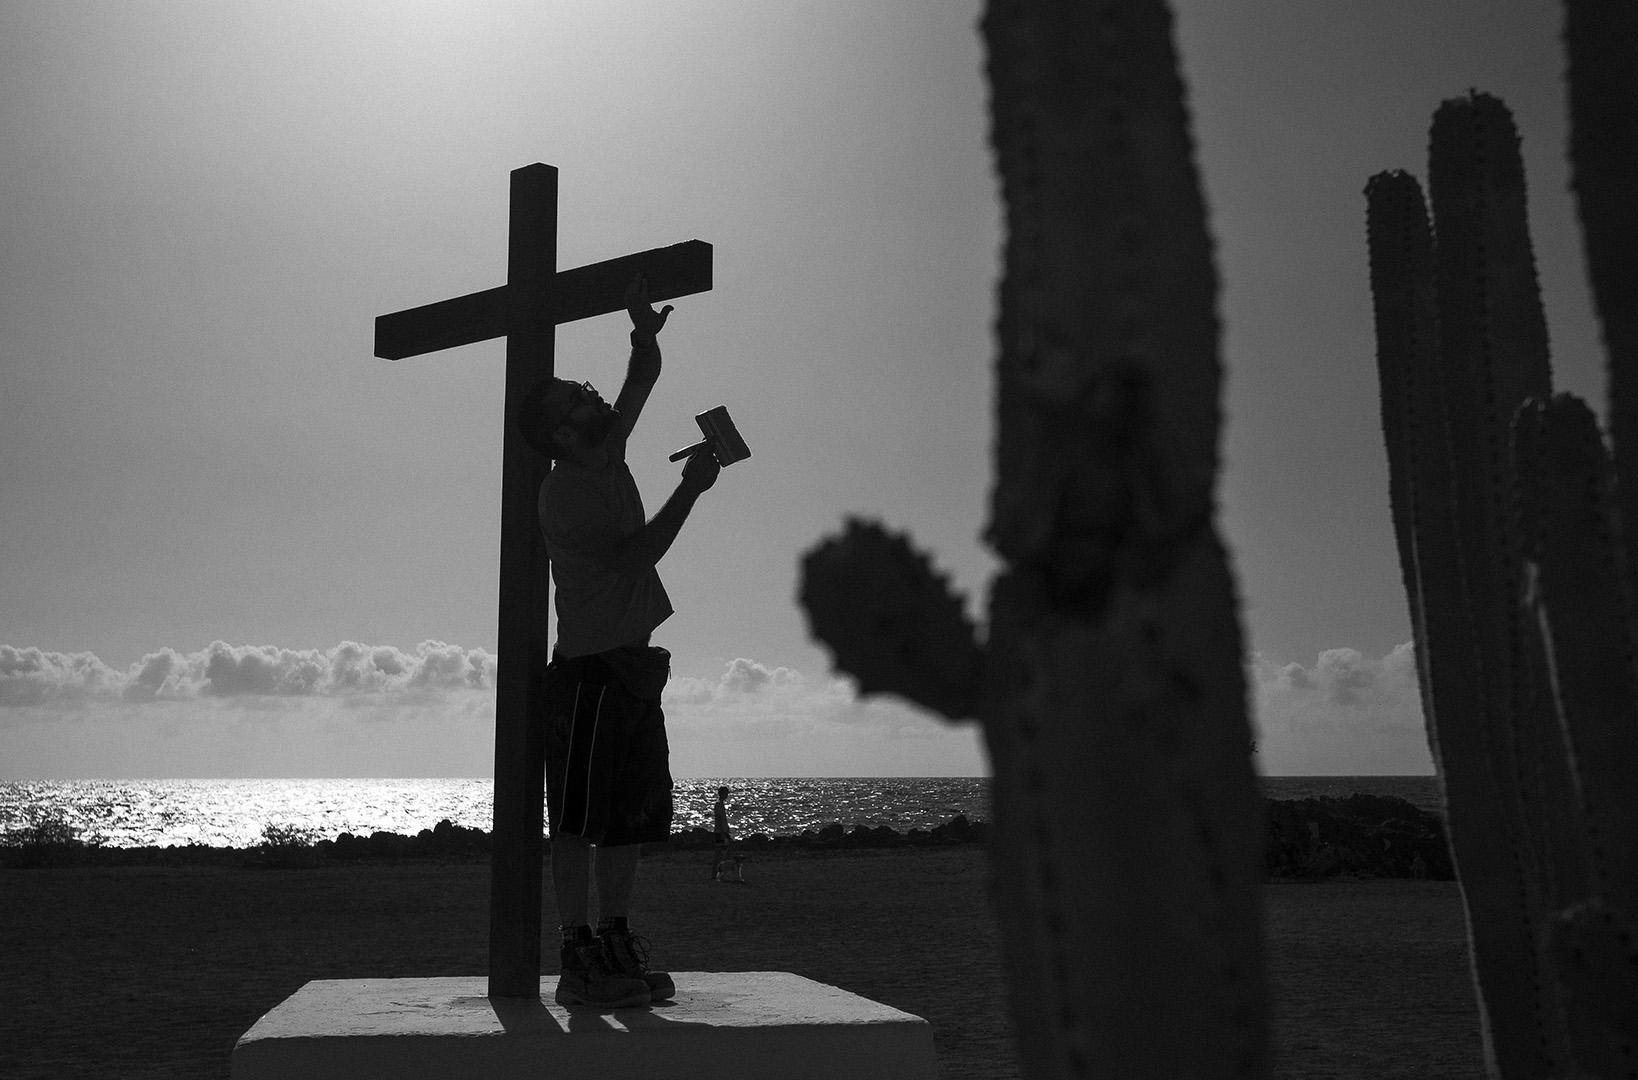 Romeria, Guimar - Socorro; Preparing the cross